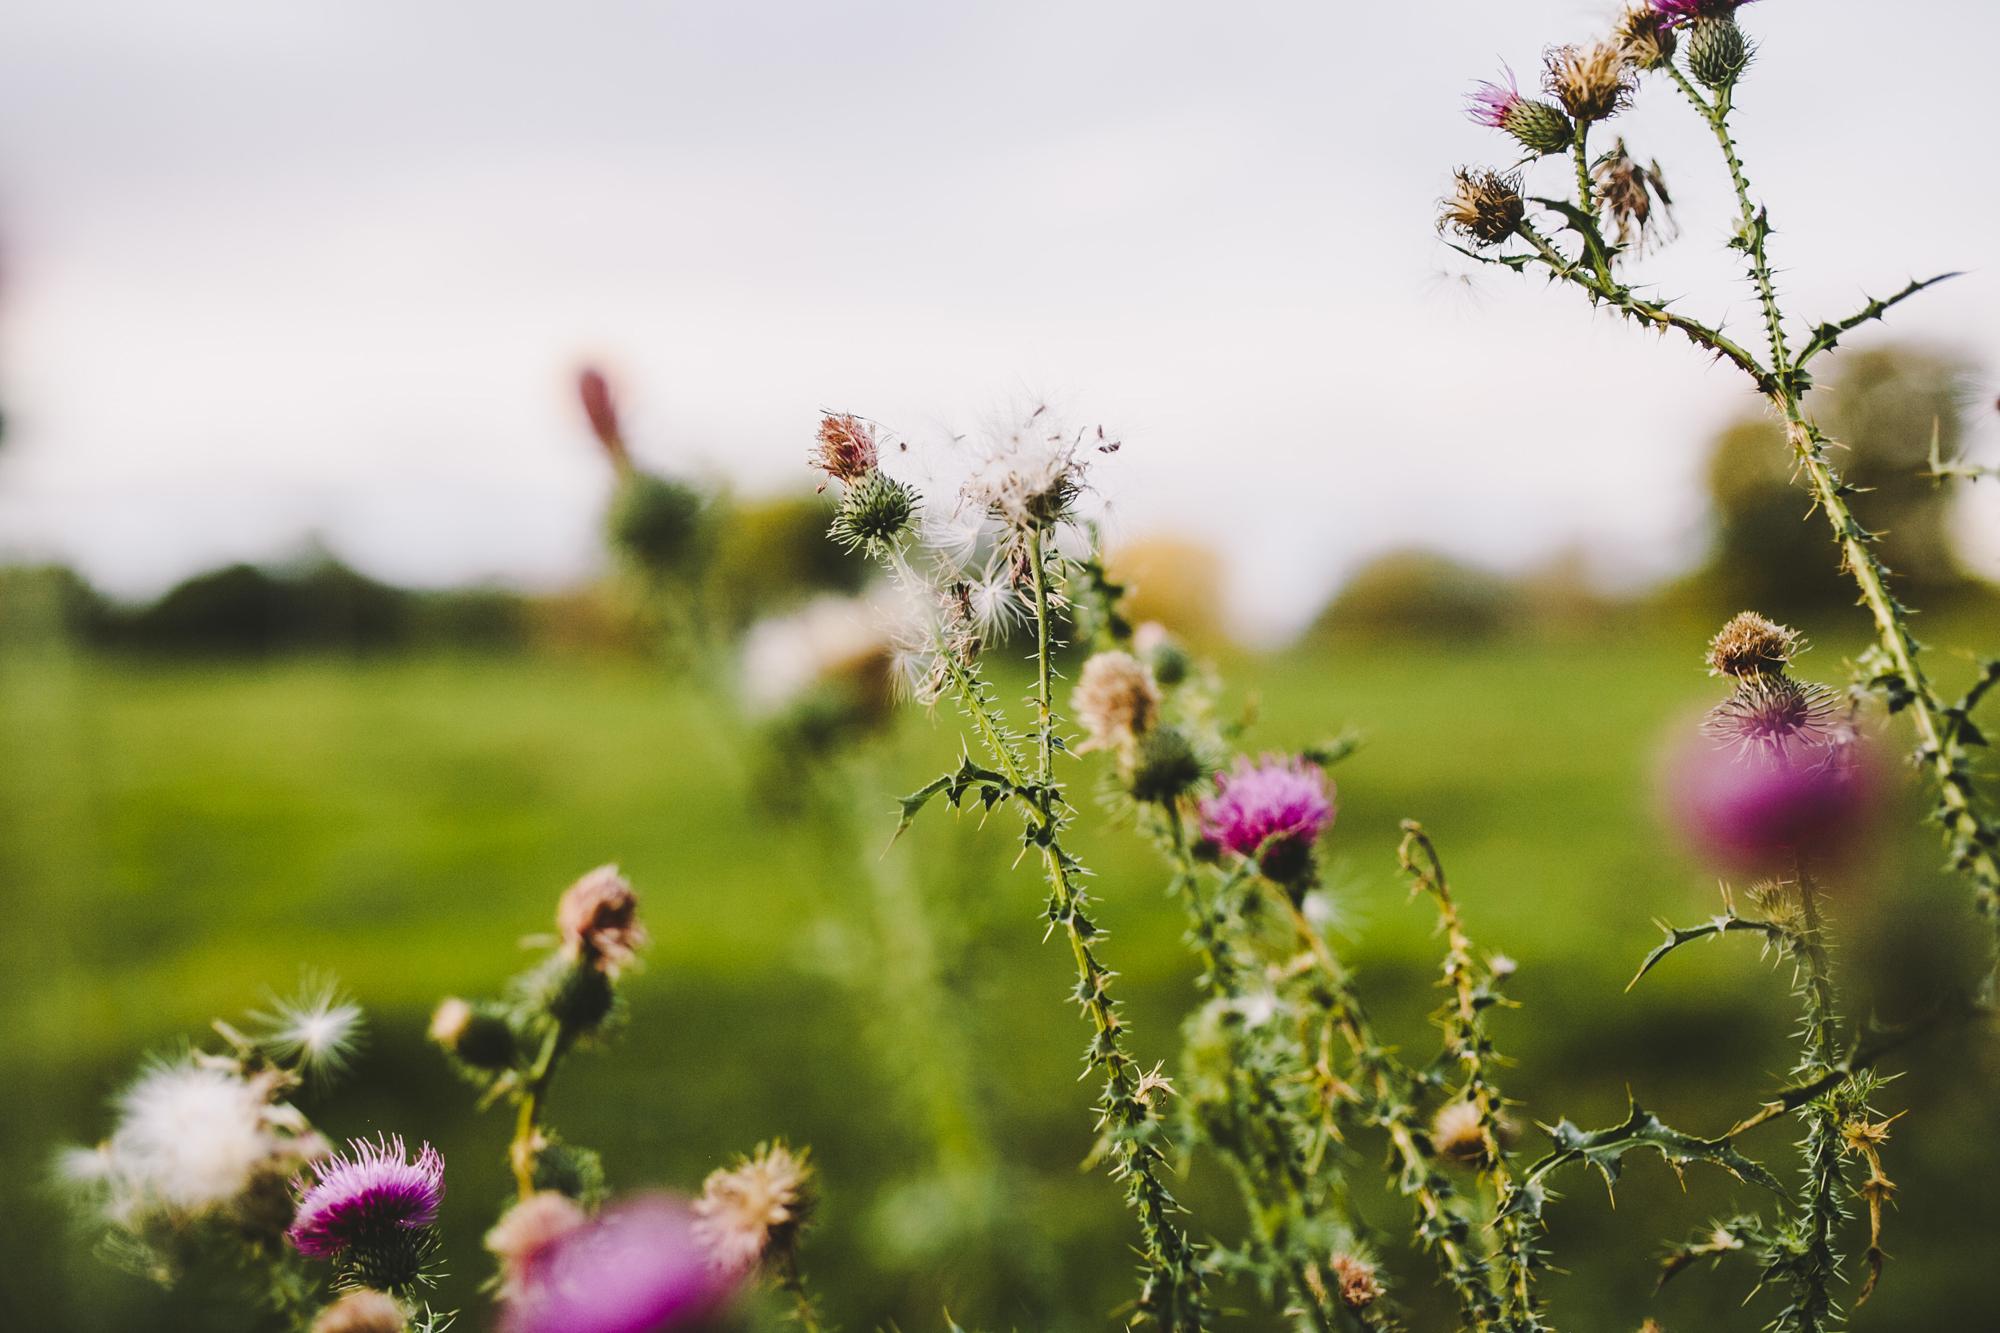 Brandon_Werth_Photography_EOY16_183.jpg